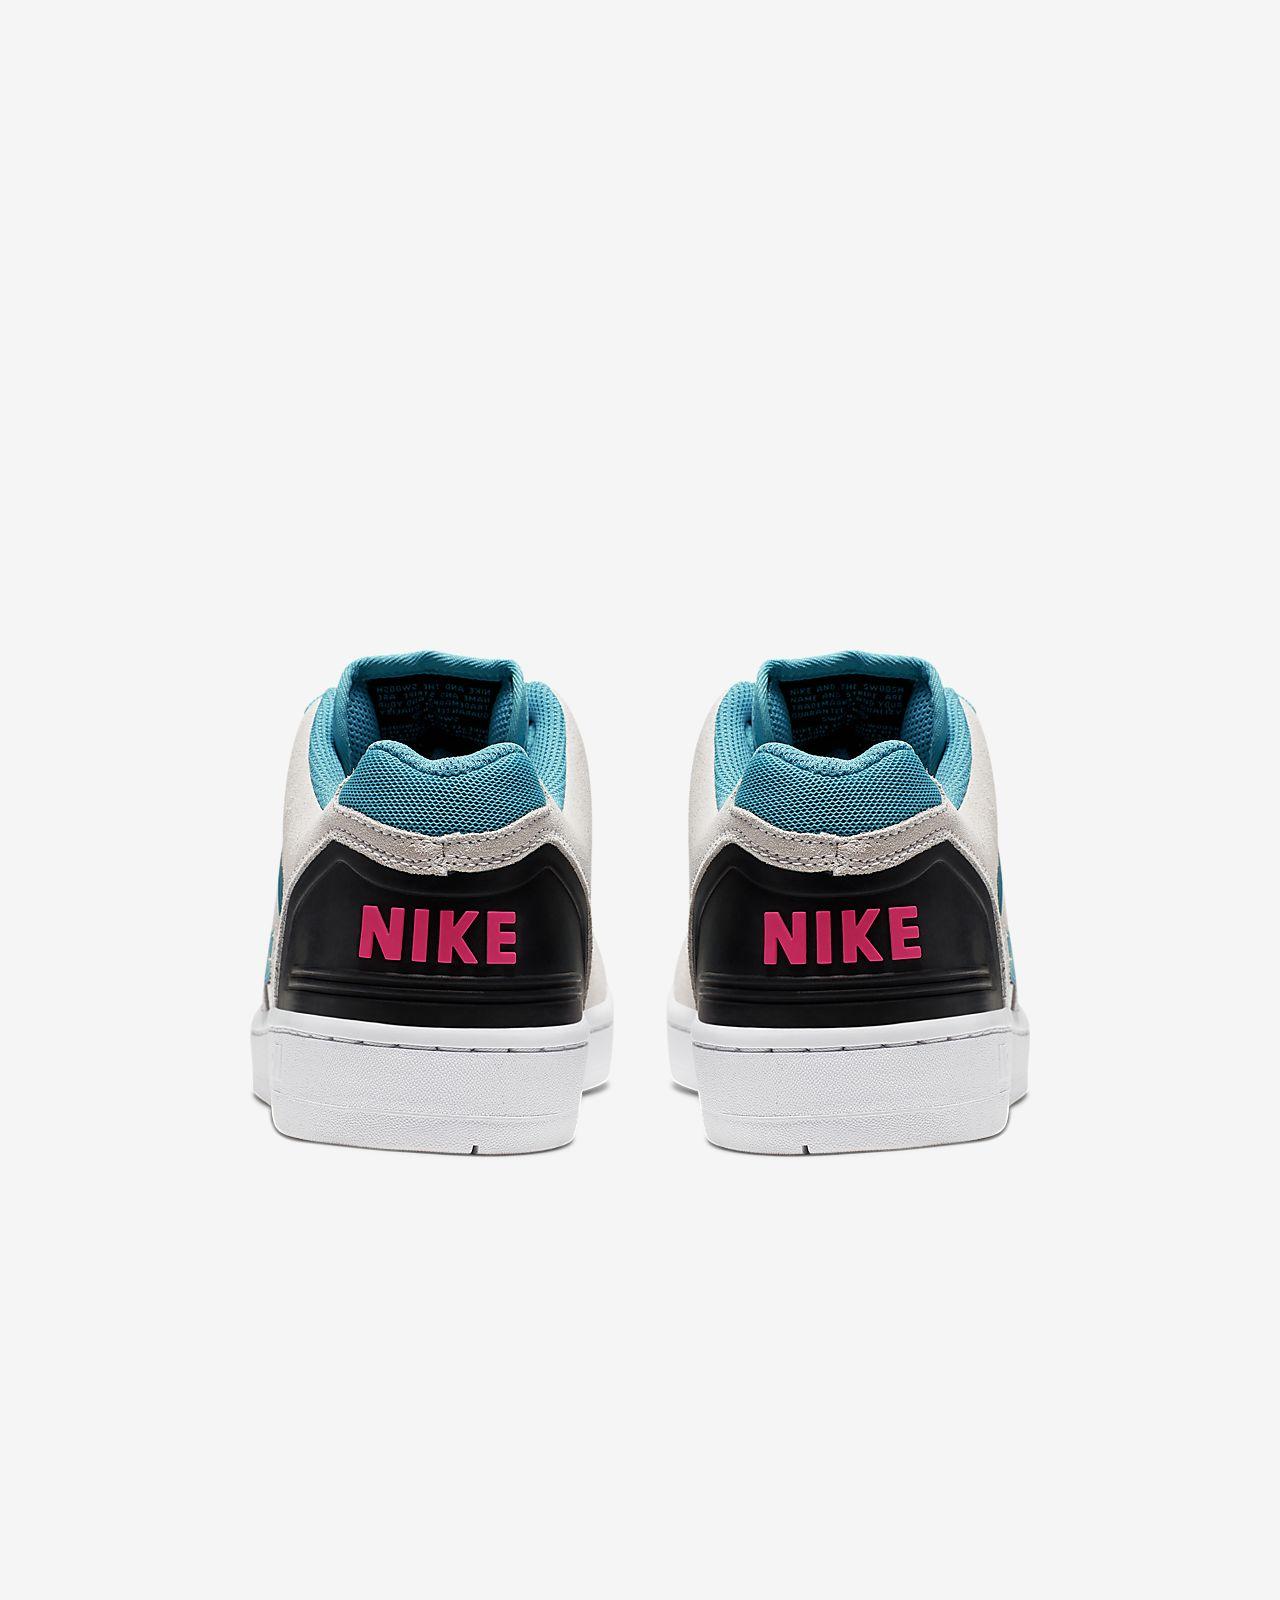 Zapatillas Nike Sb Air Force 2 Low White Blue Ao0300 100